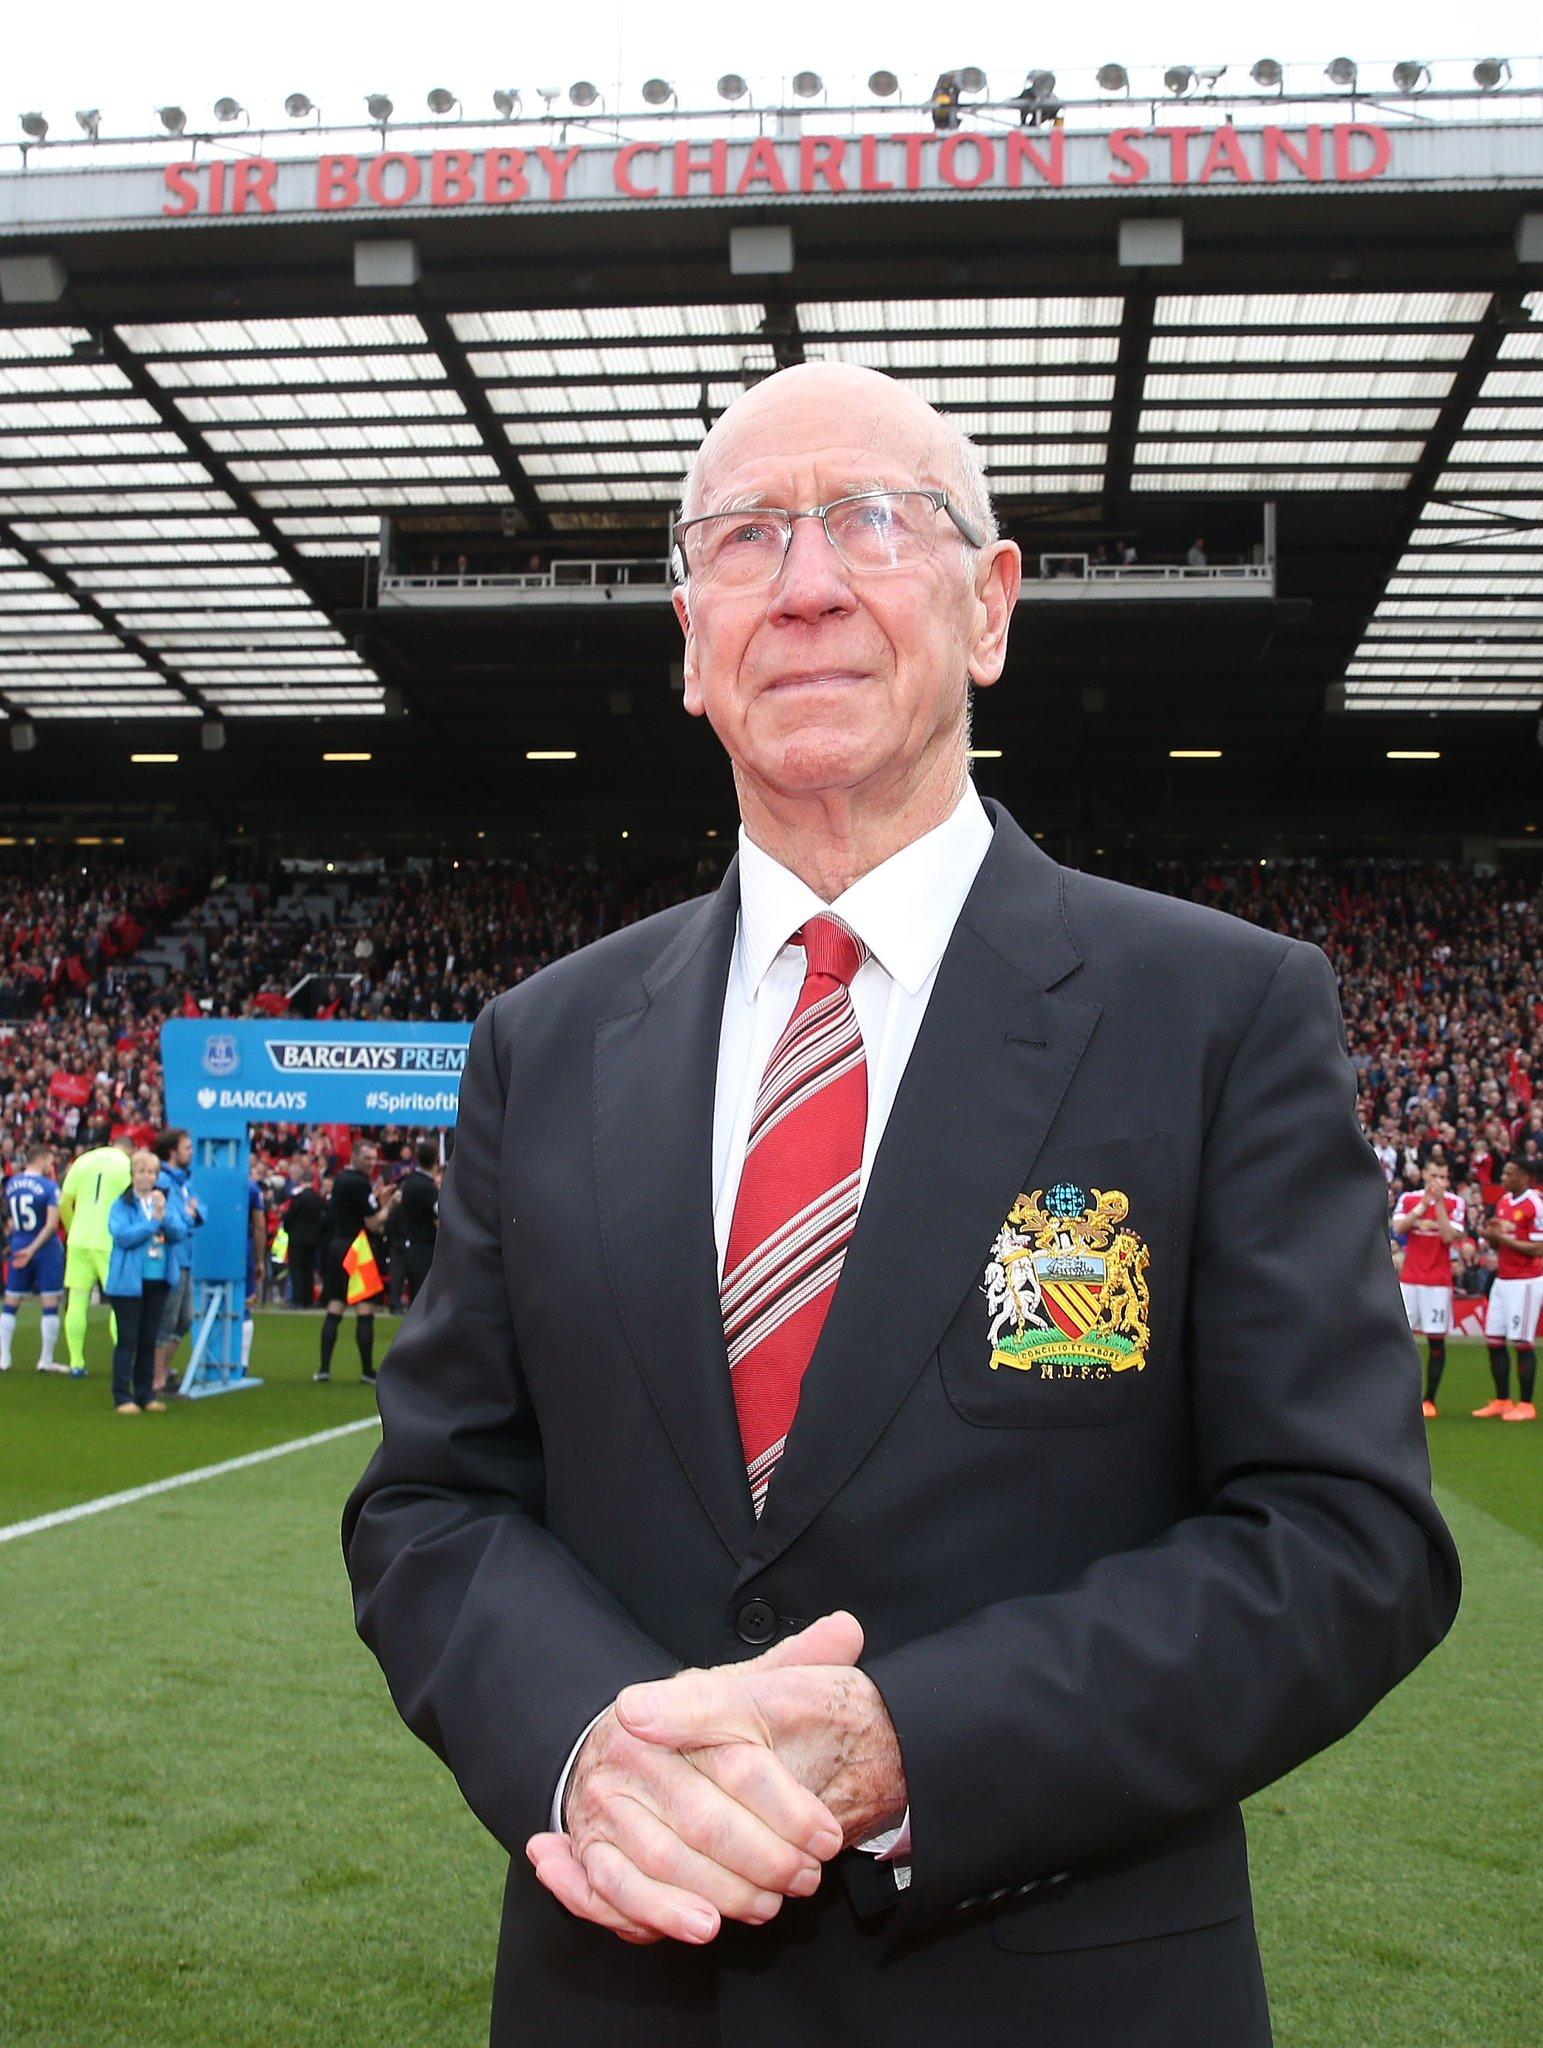 Wishing legend Sir Bobby Charlton a very happy 80th birthday today!